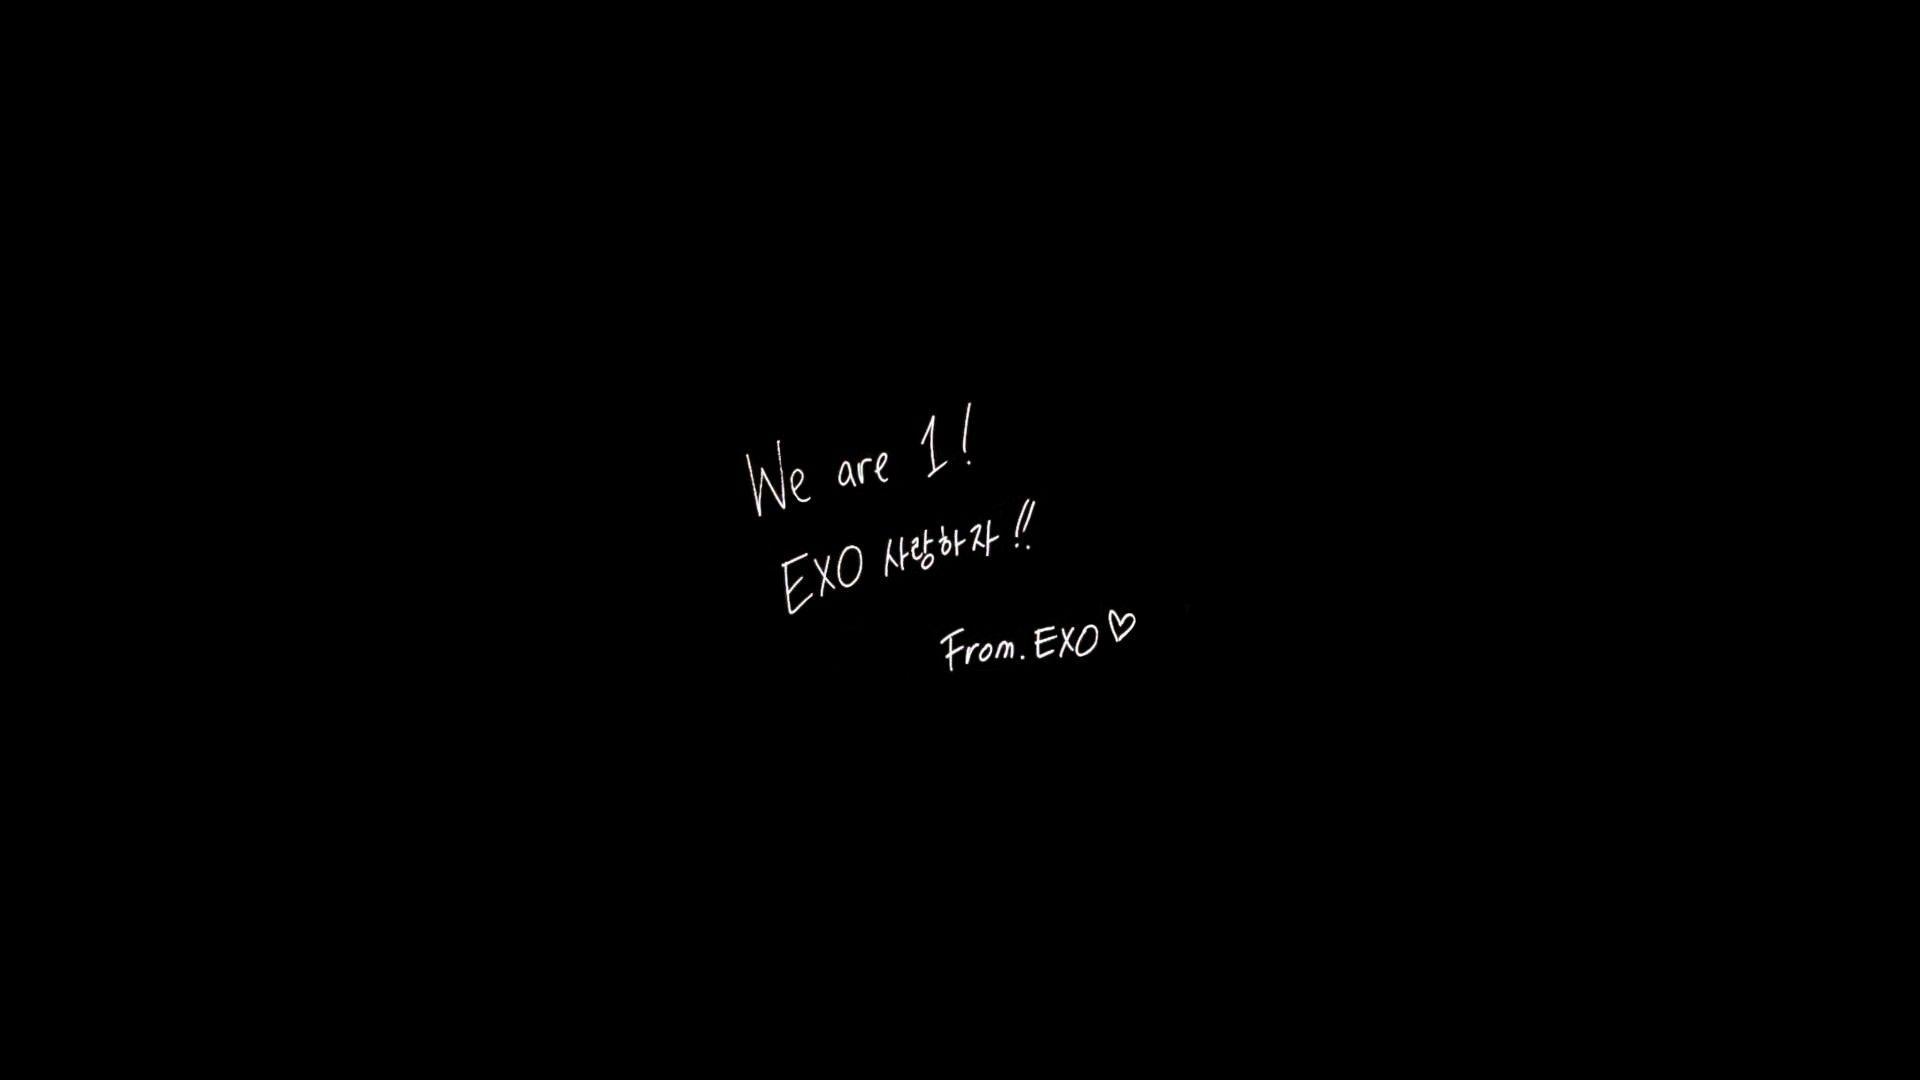 Exo Logo Wallpaper Hd